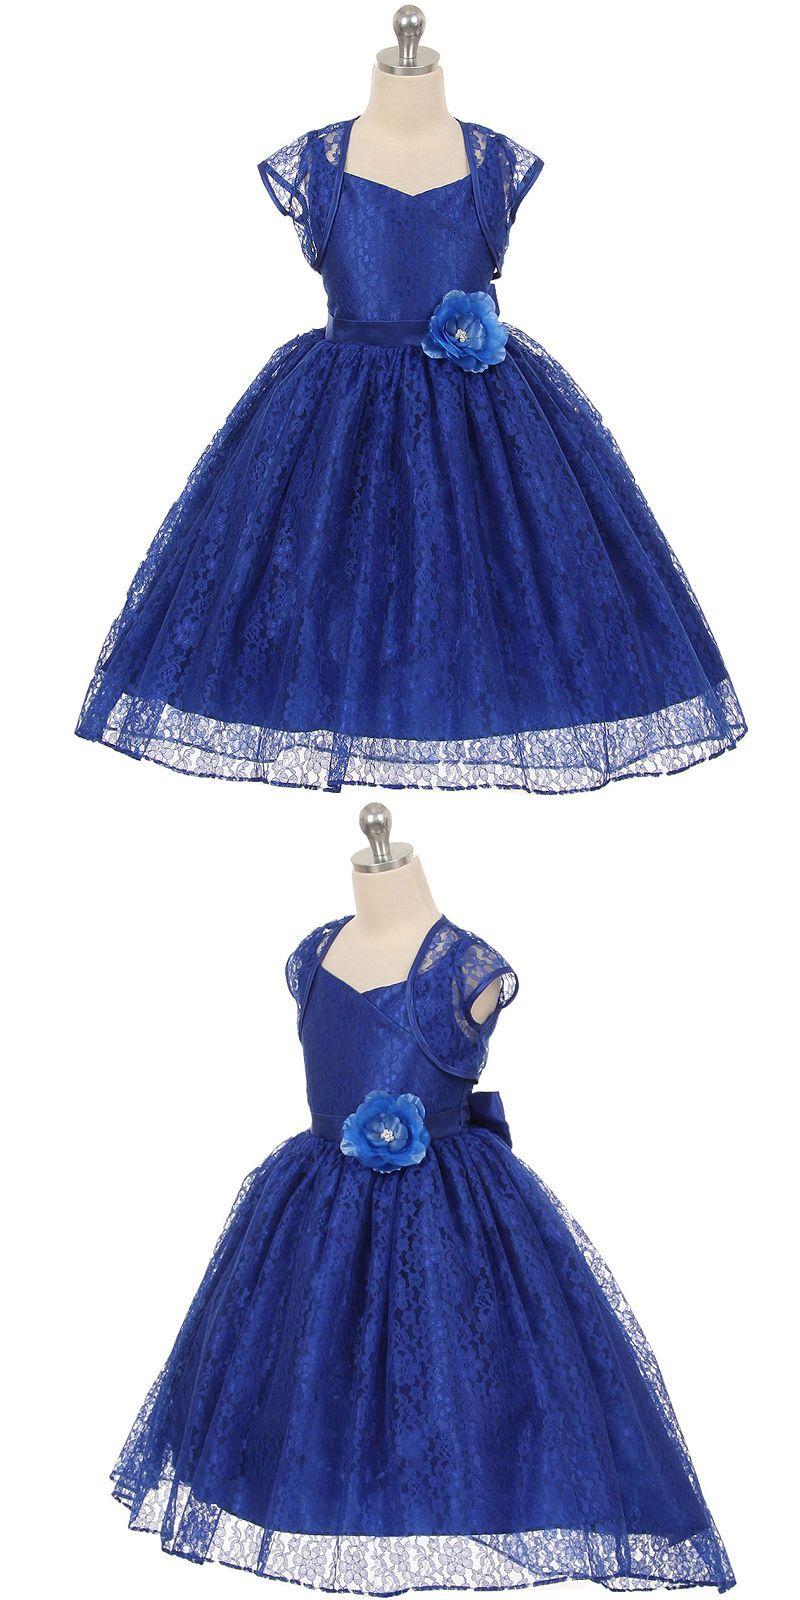 Dresses flower girl dresses royal blue birthday wedding